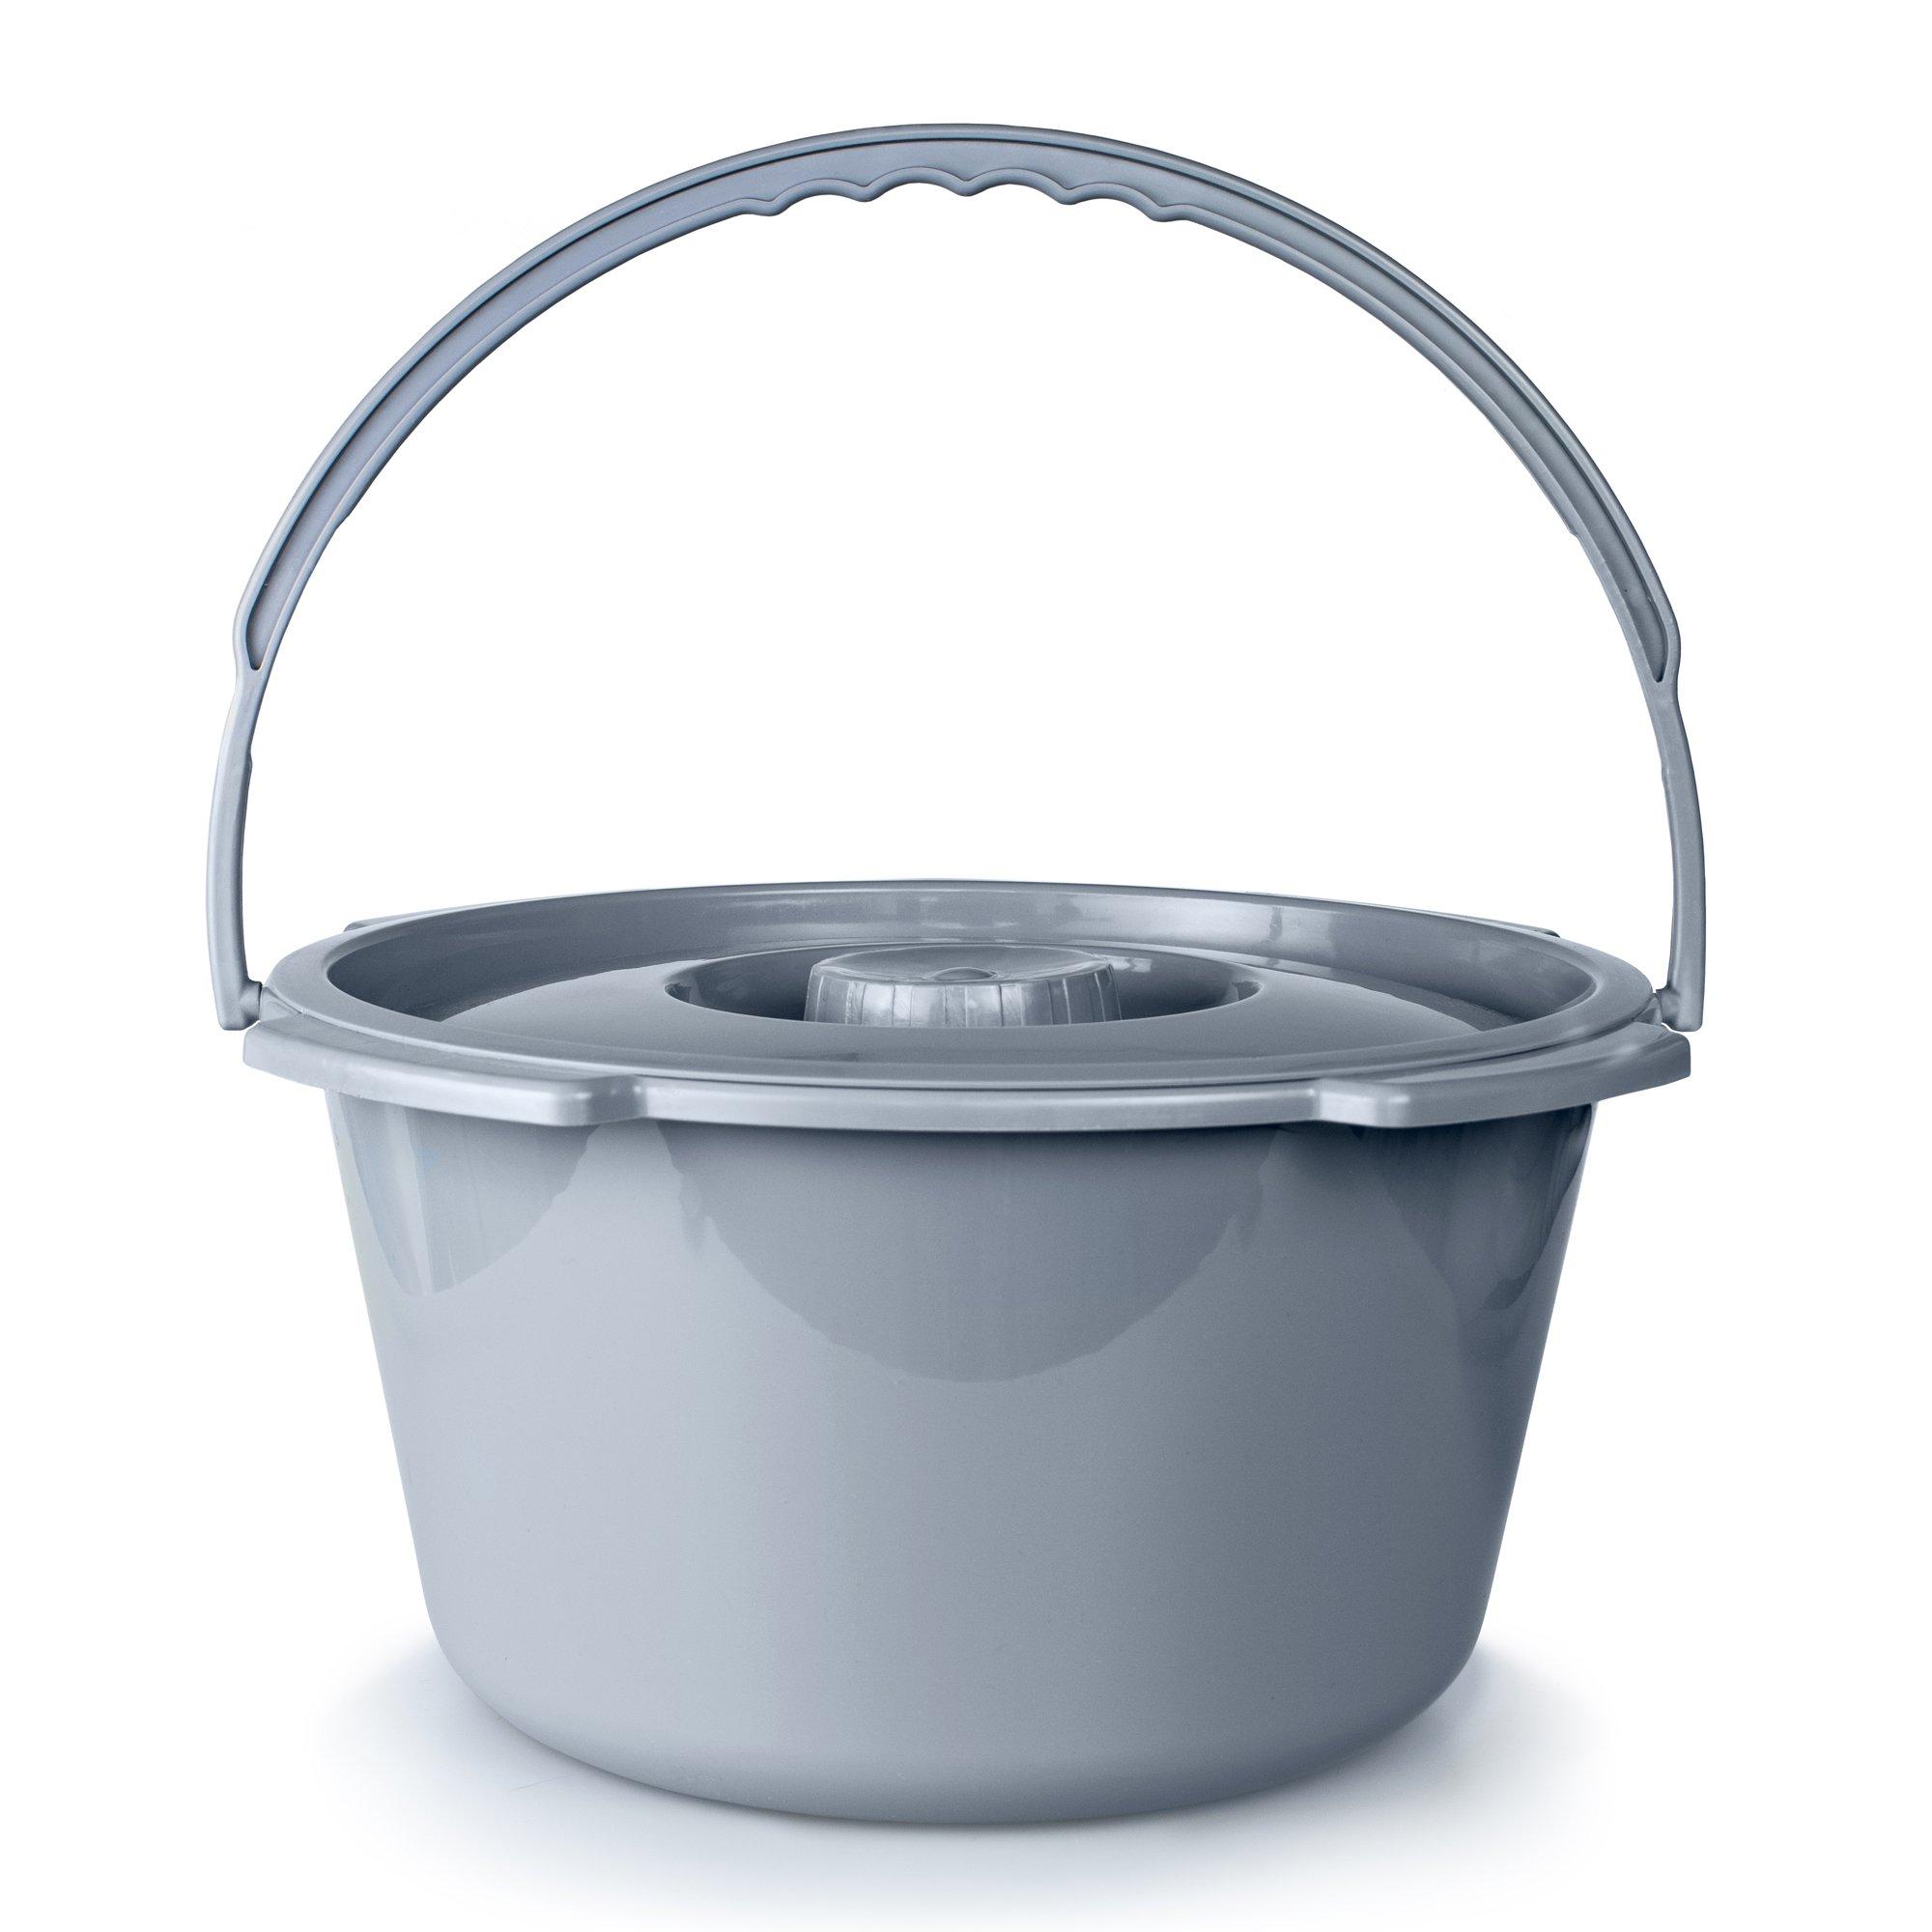 McKesson Commode Bucket, 146-11106, 1 Each